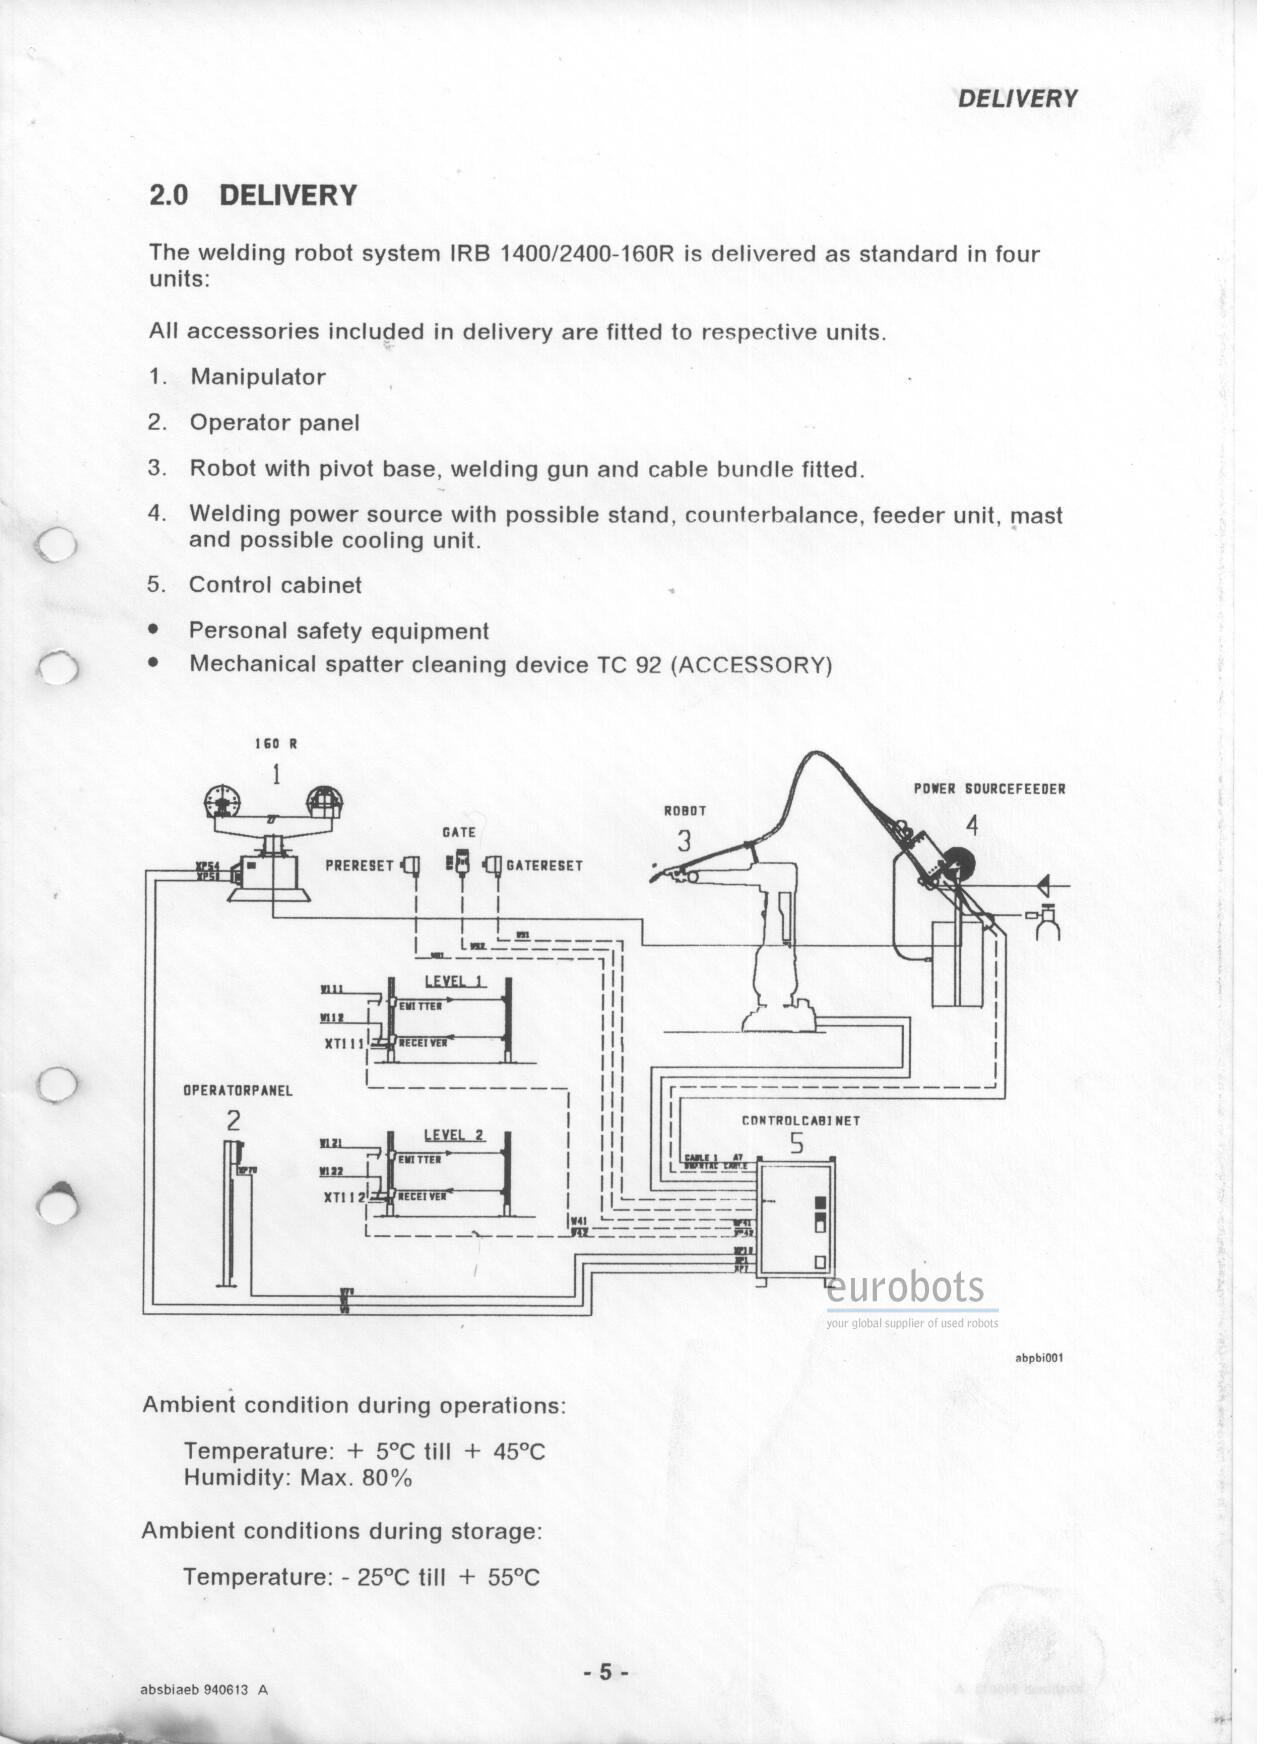 hight resolution of abb irc5 wiring diagram 23 wiring diagram images abb ats021 wiring diagram abb ats021 wiring diagram